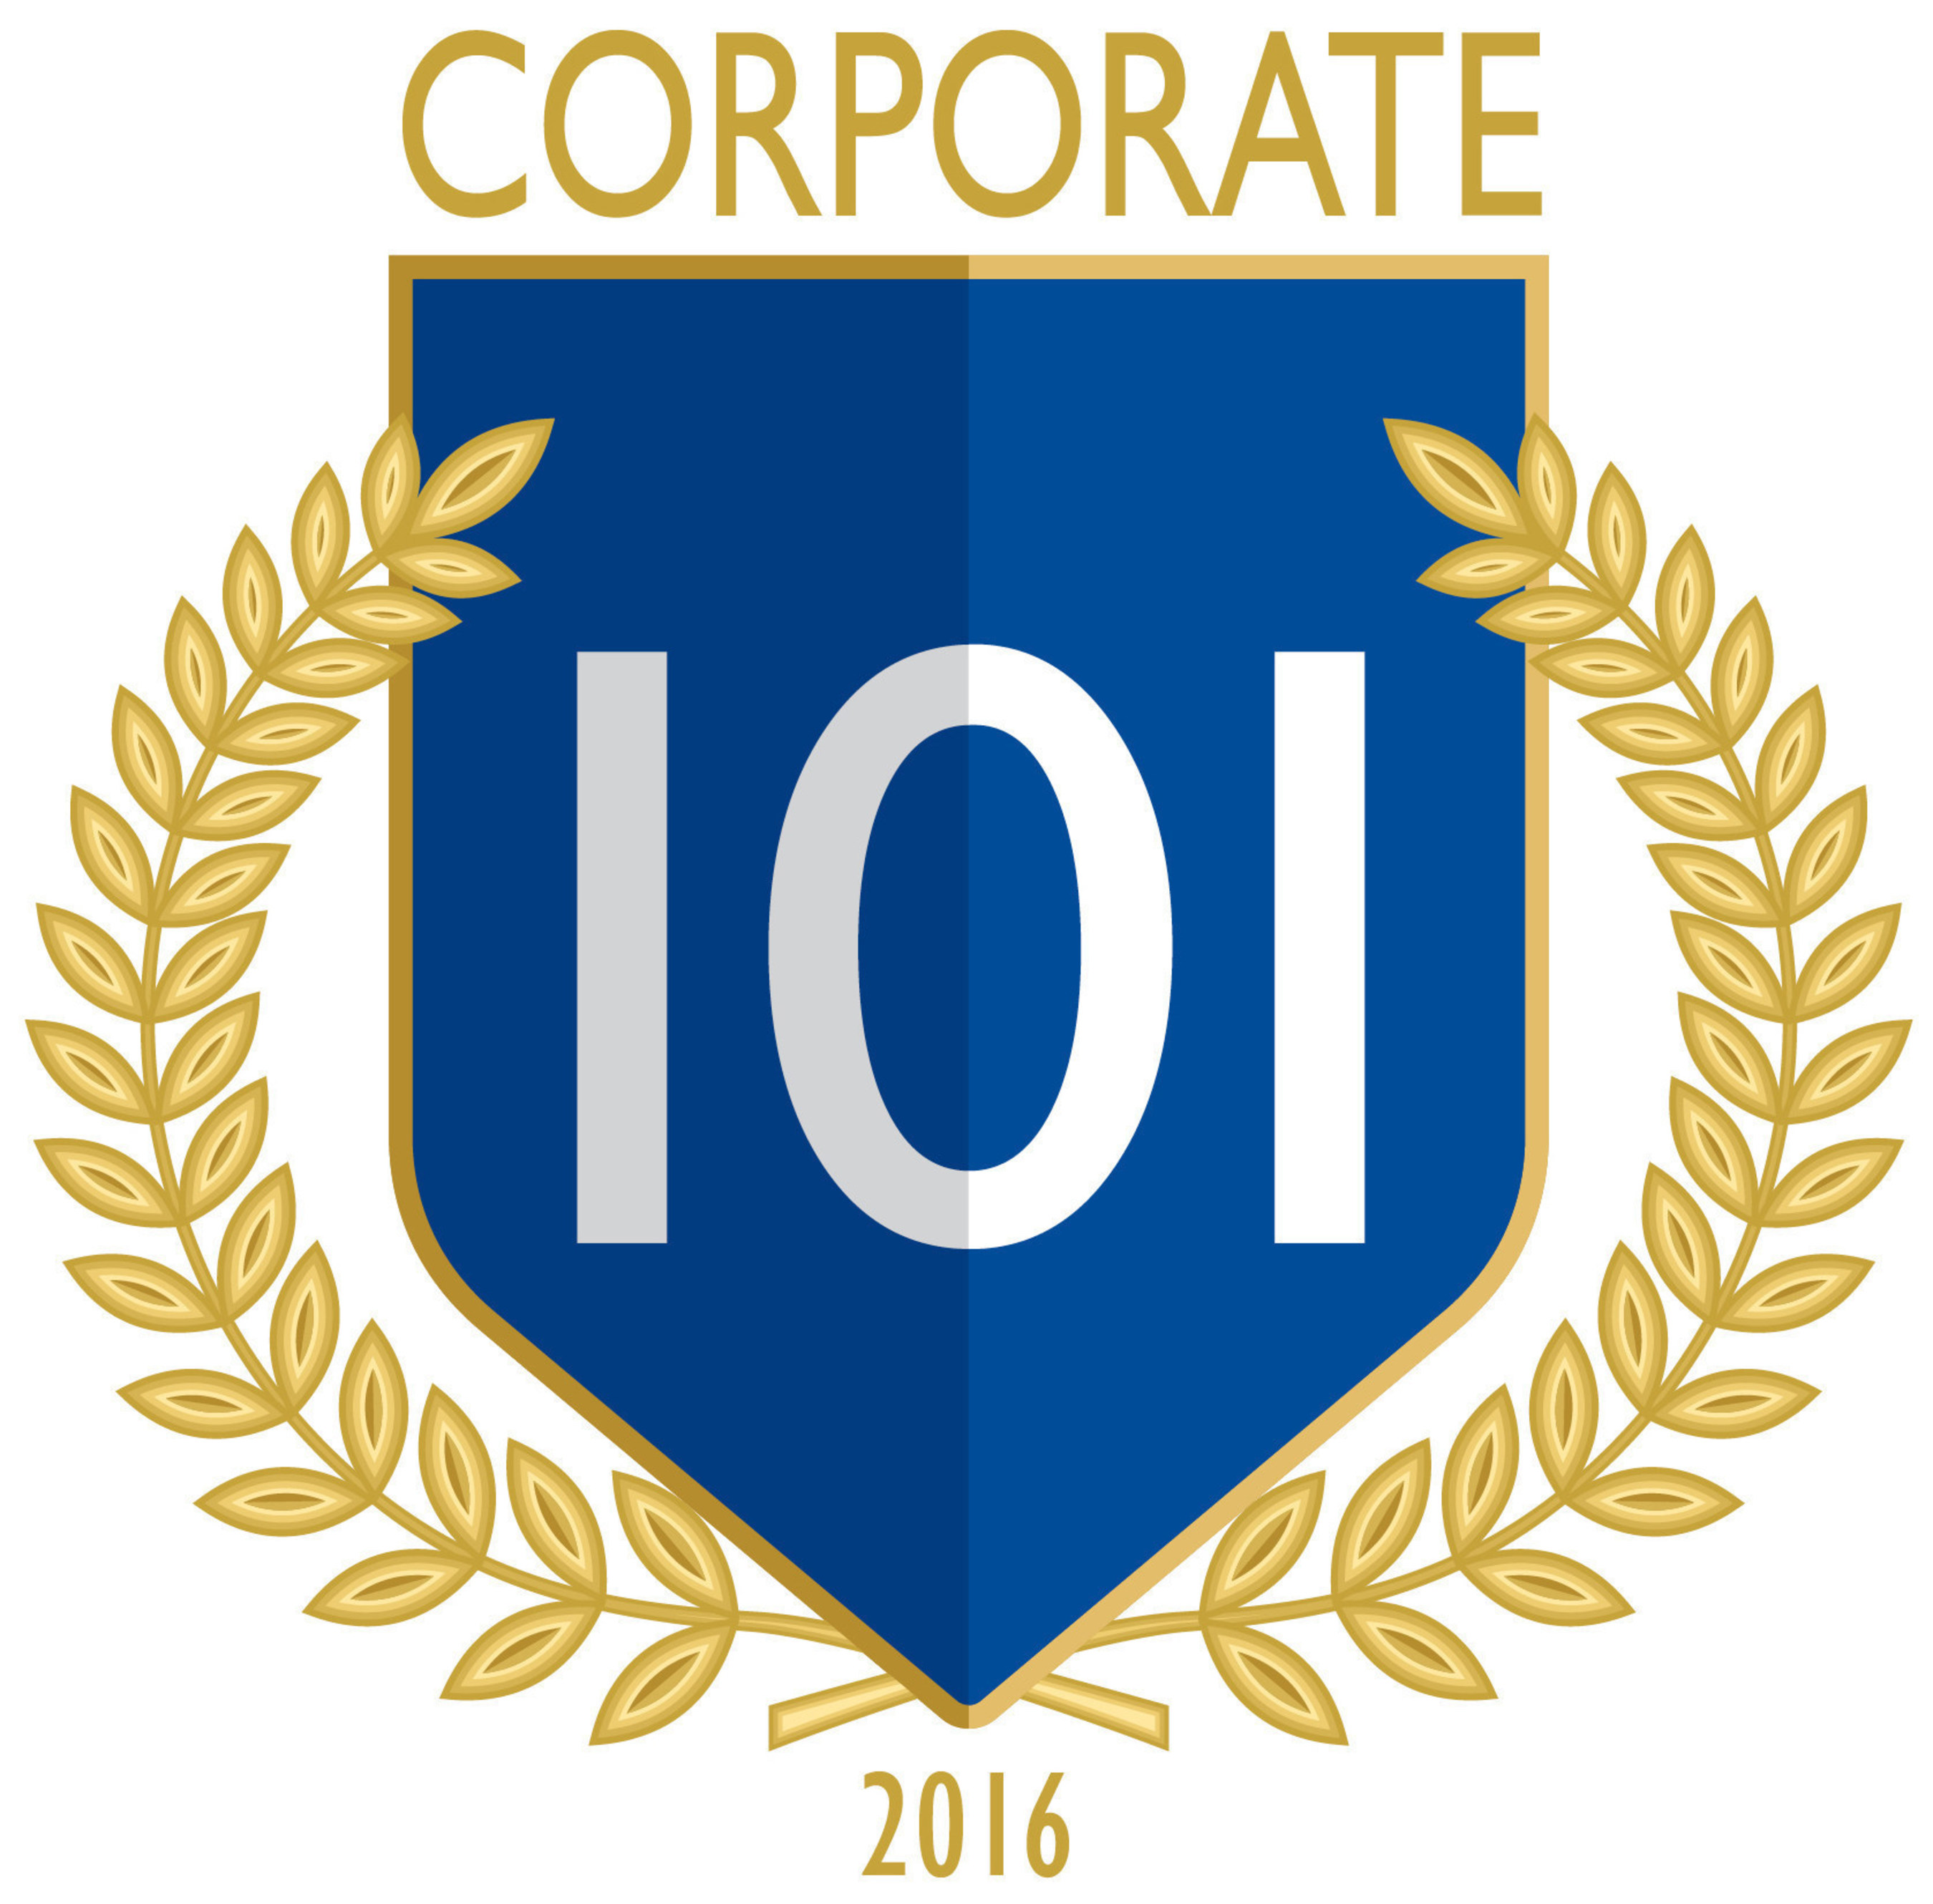 MBN USA Corporate 101 Logo - 2016